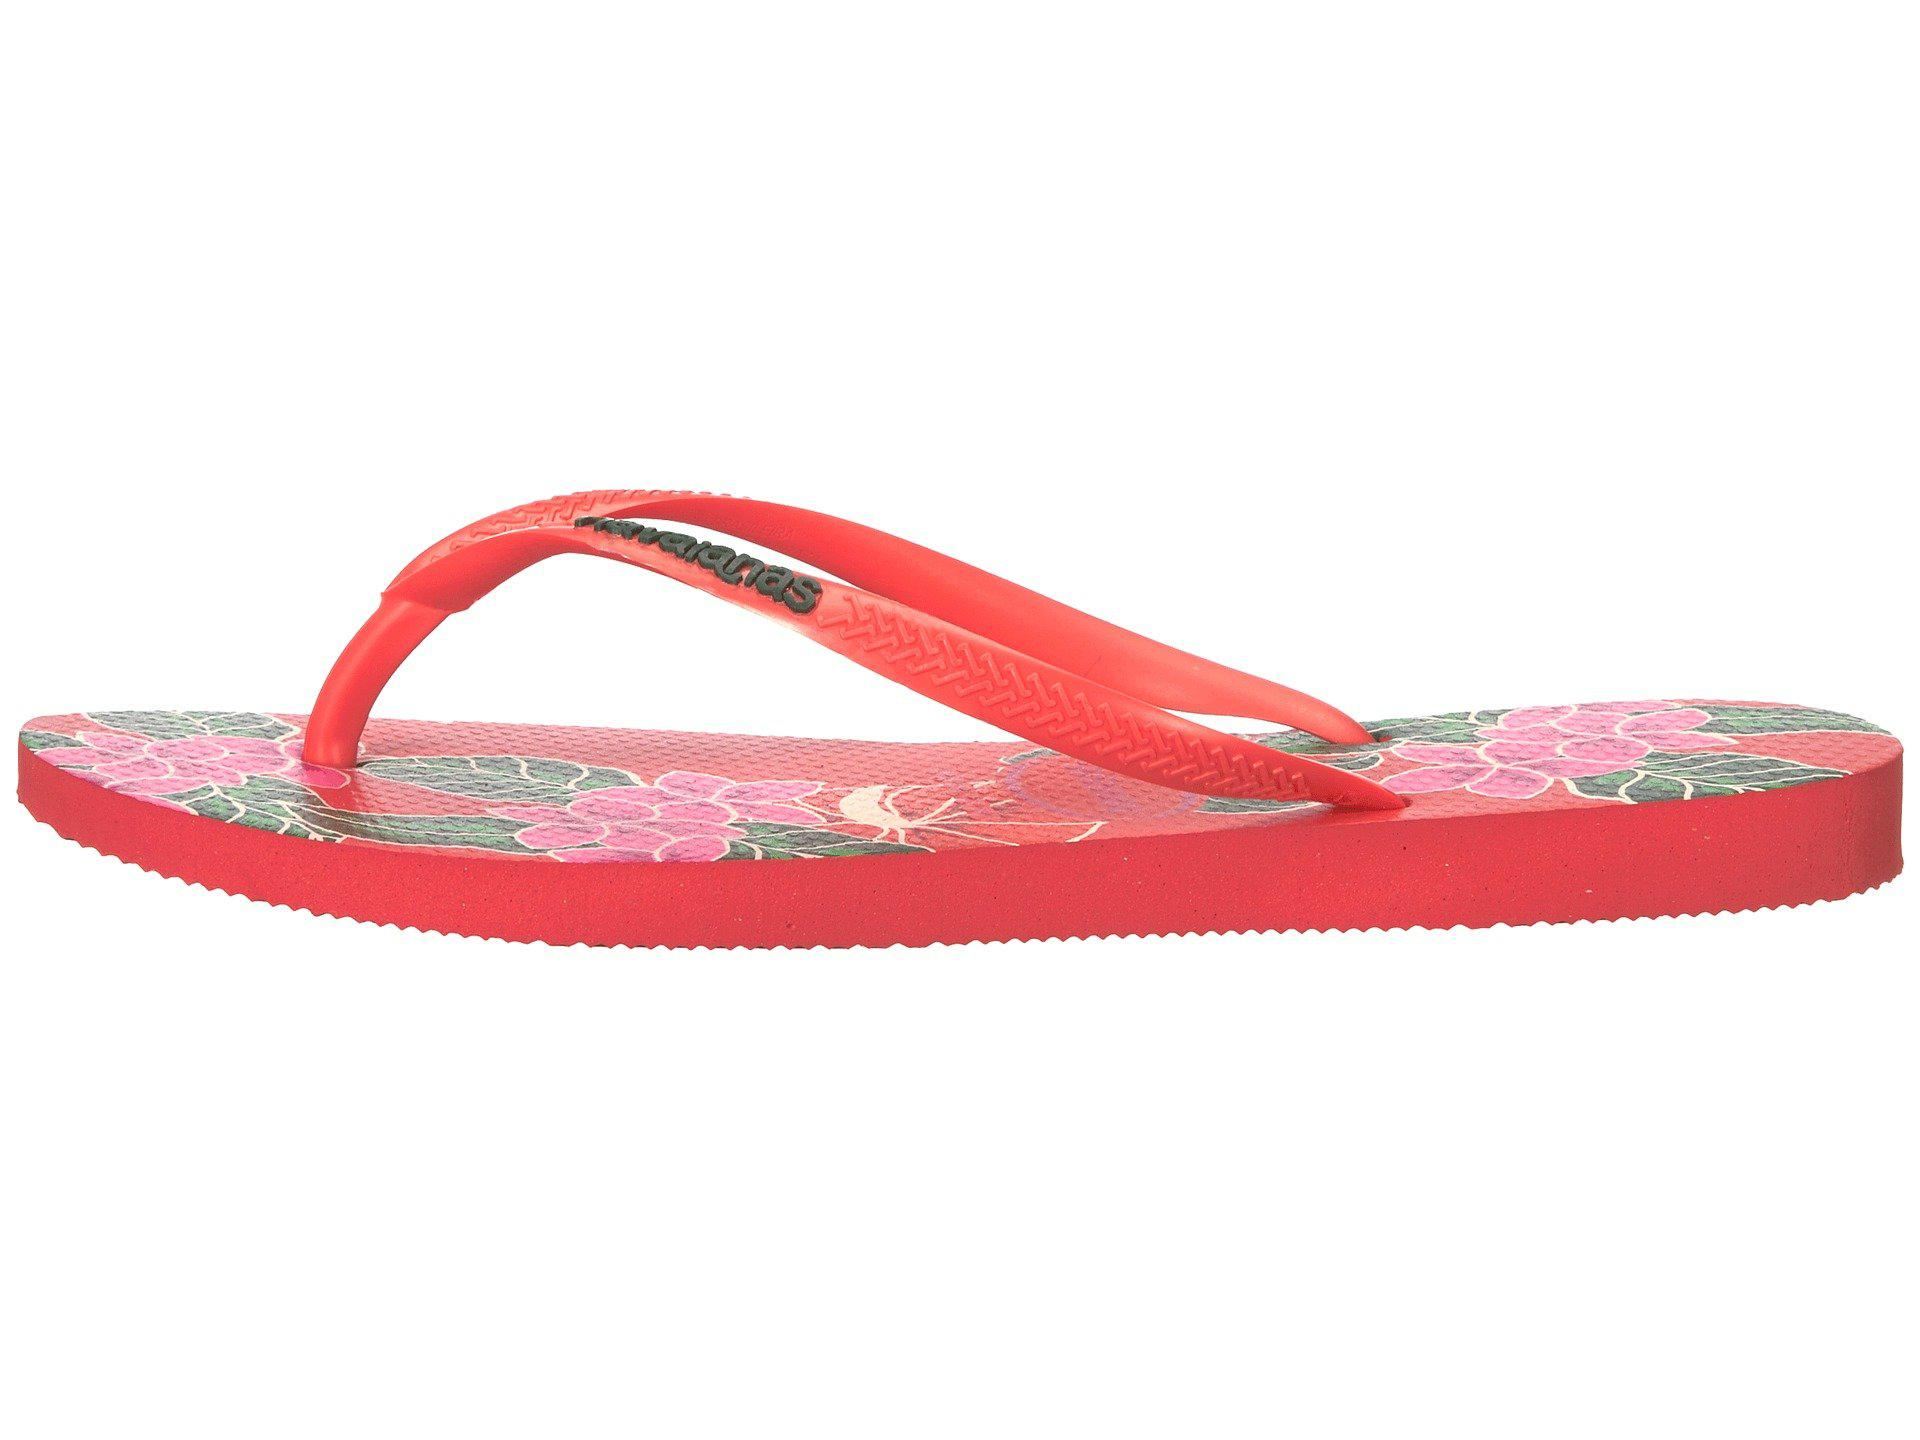 Havaianas Slim Floral Coral Womens Summer Flip Flops